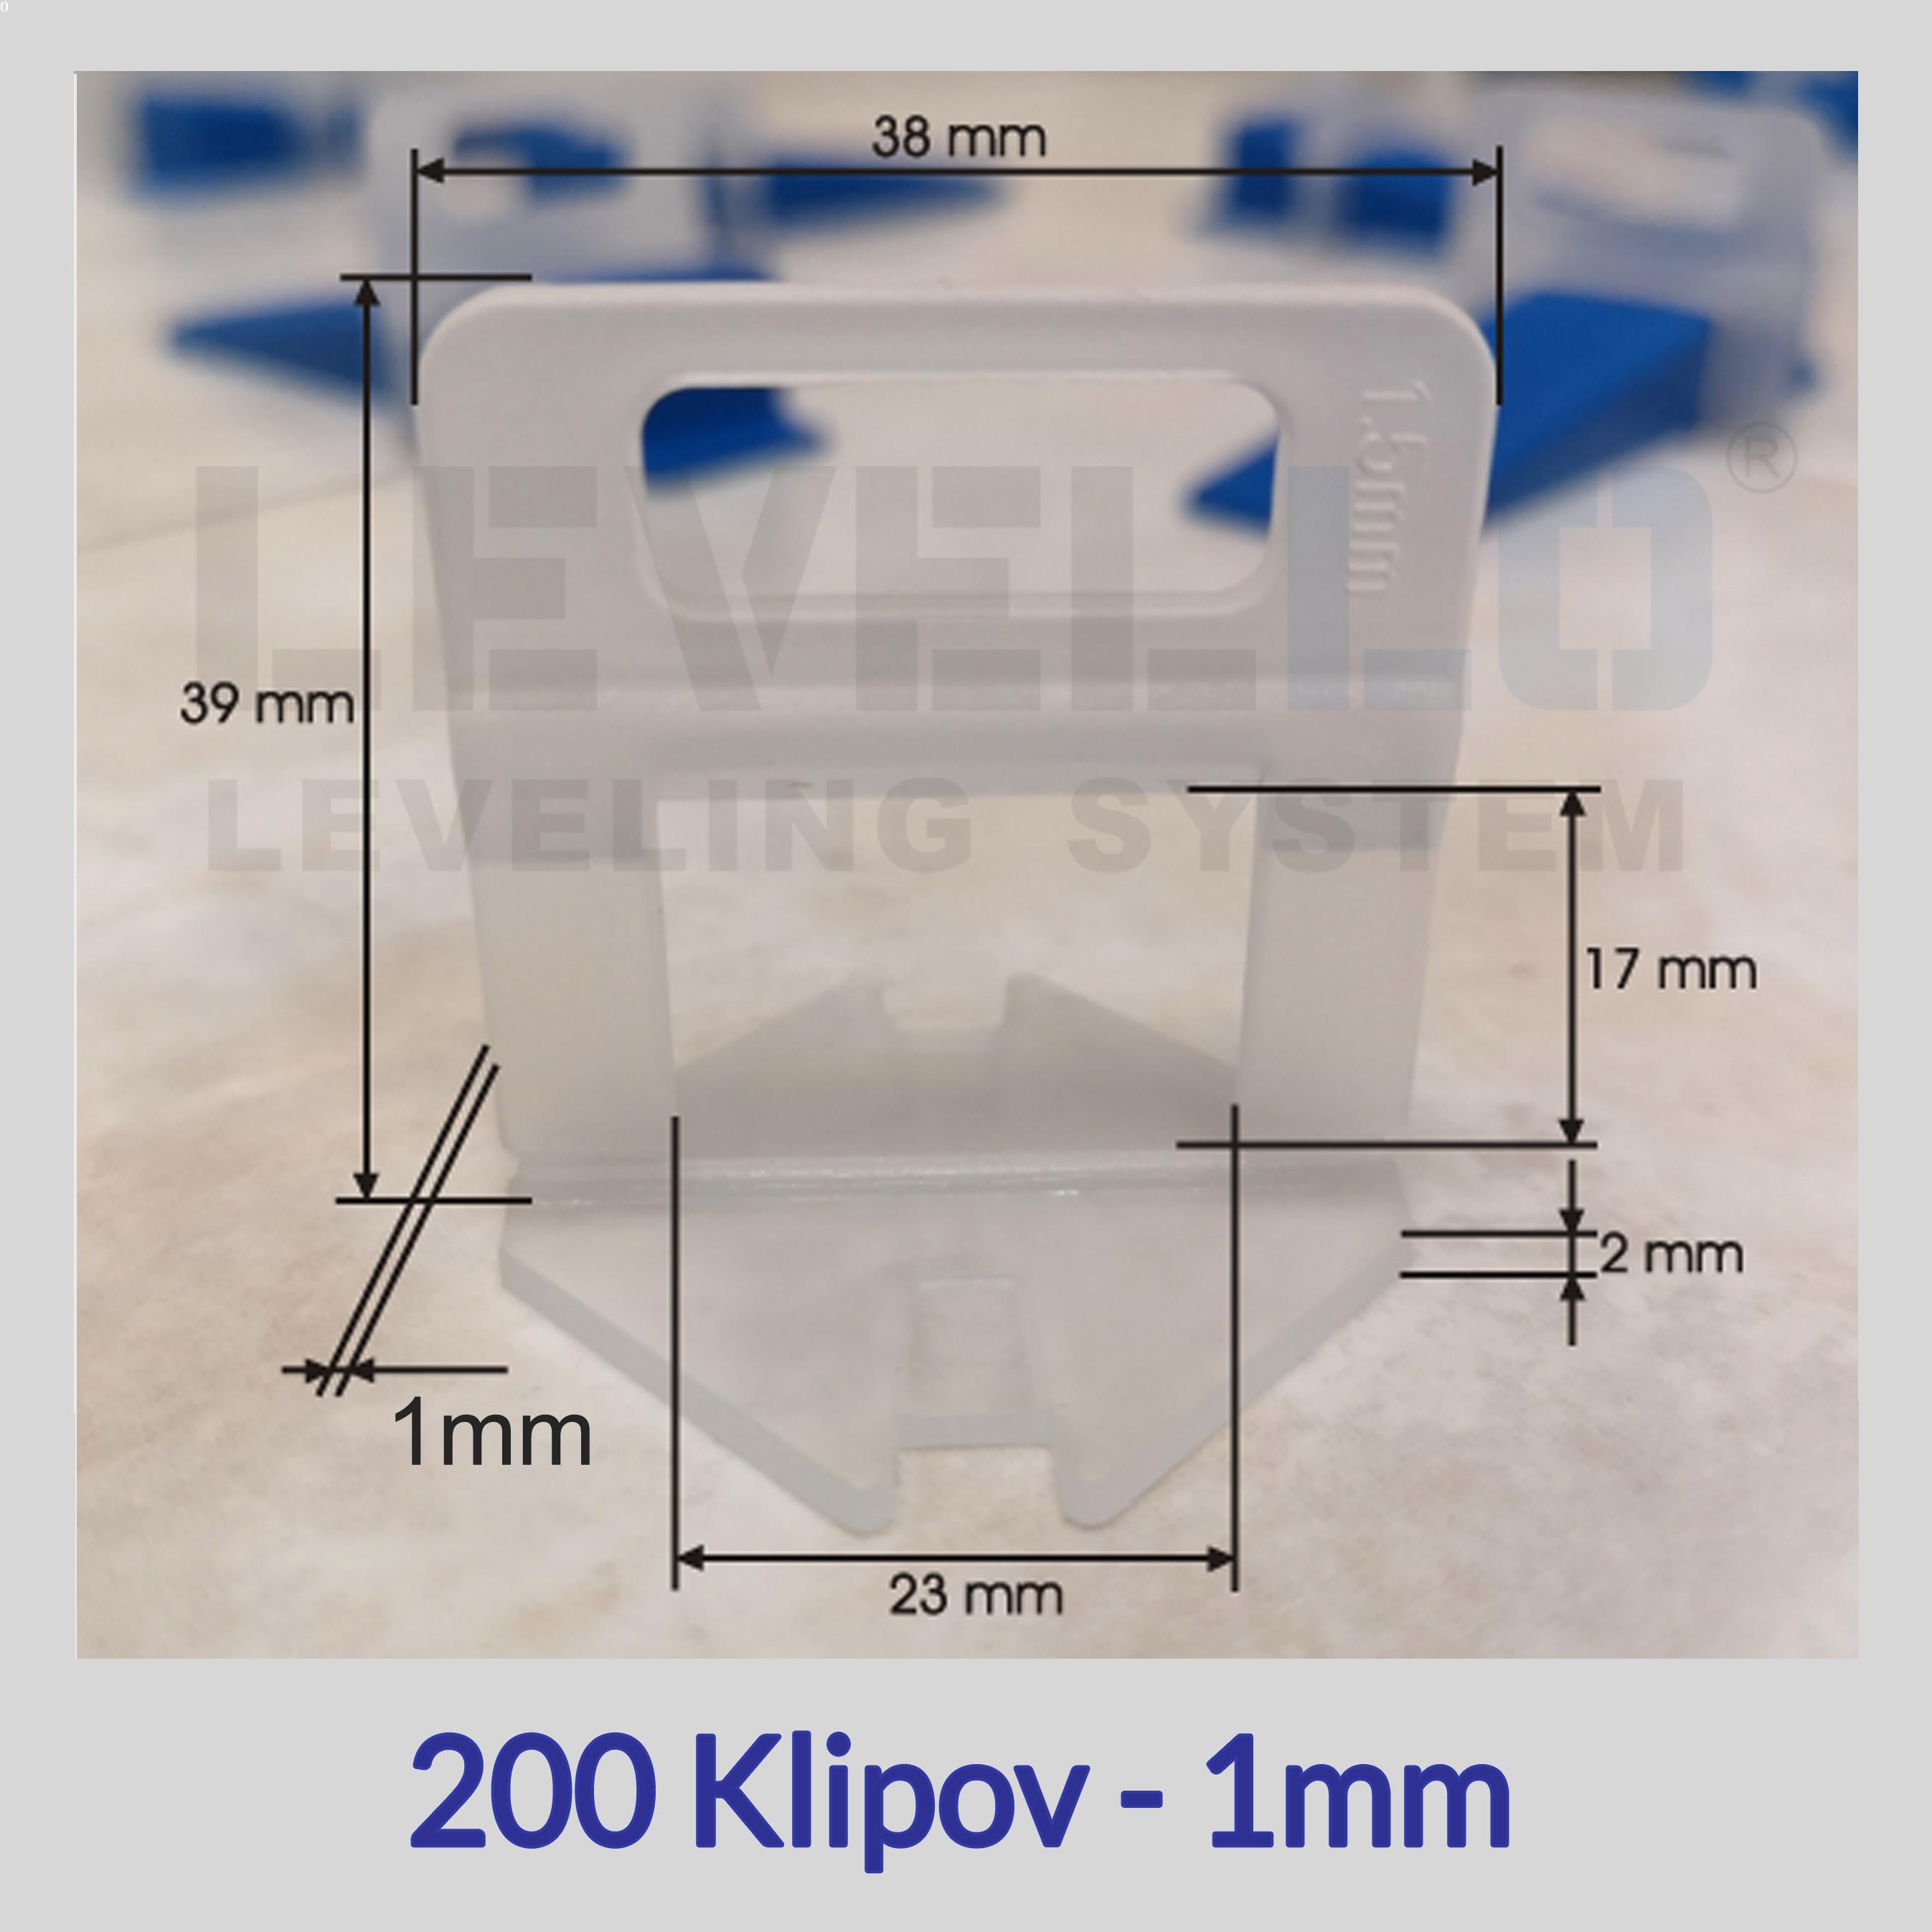 Klipy Eko LEVELLO ® 1 mm, 200 kusov